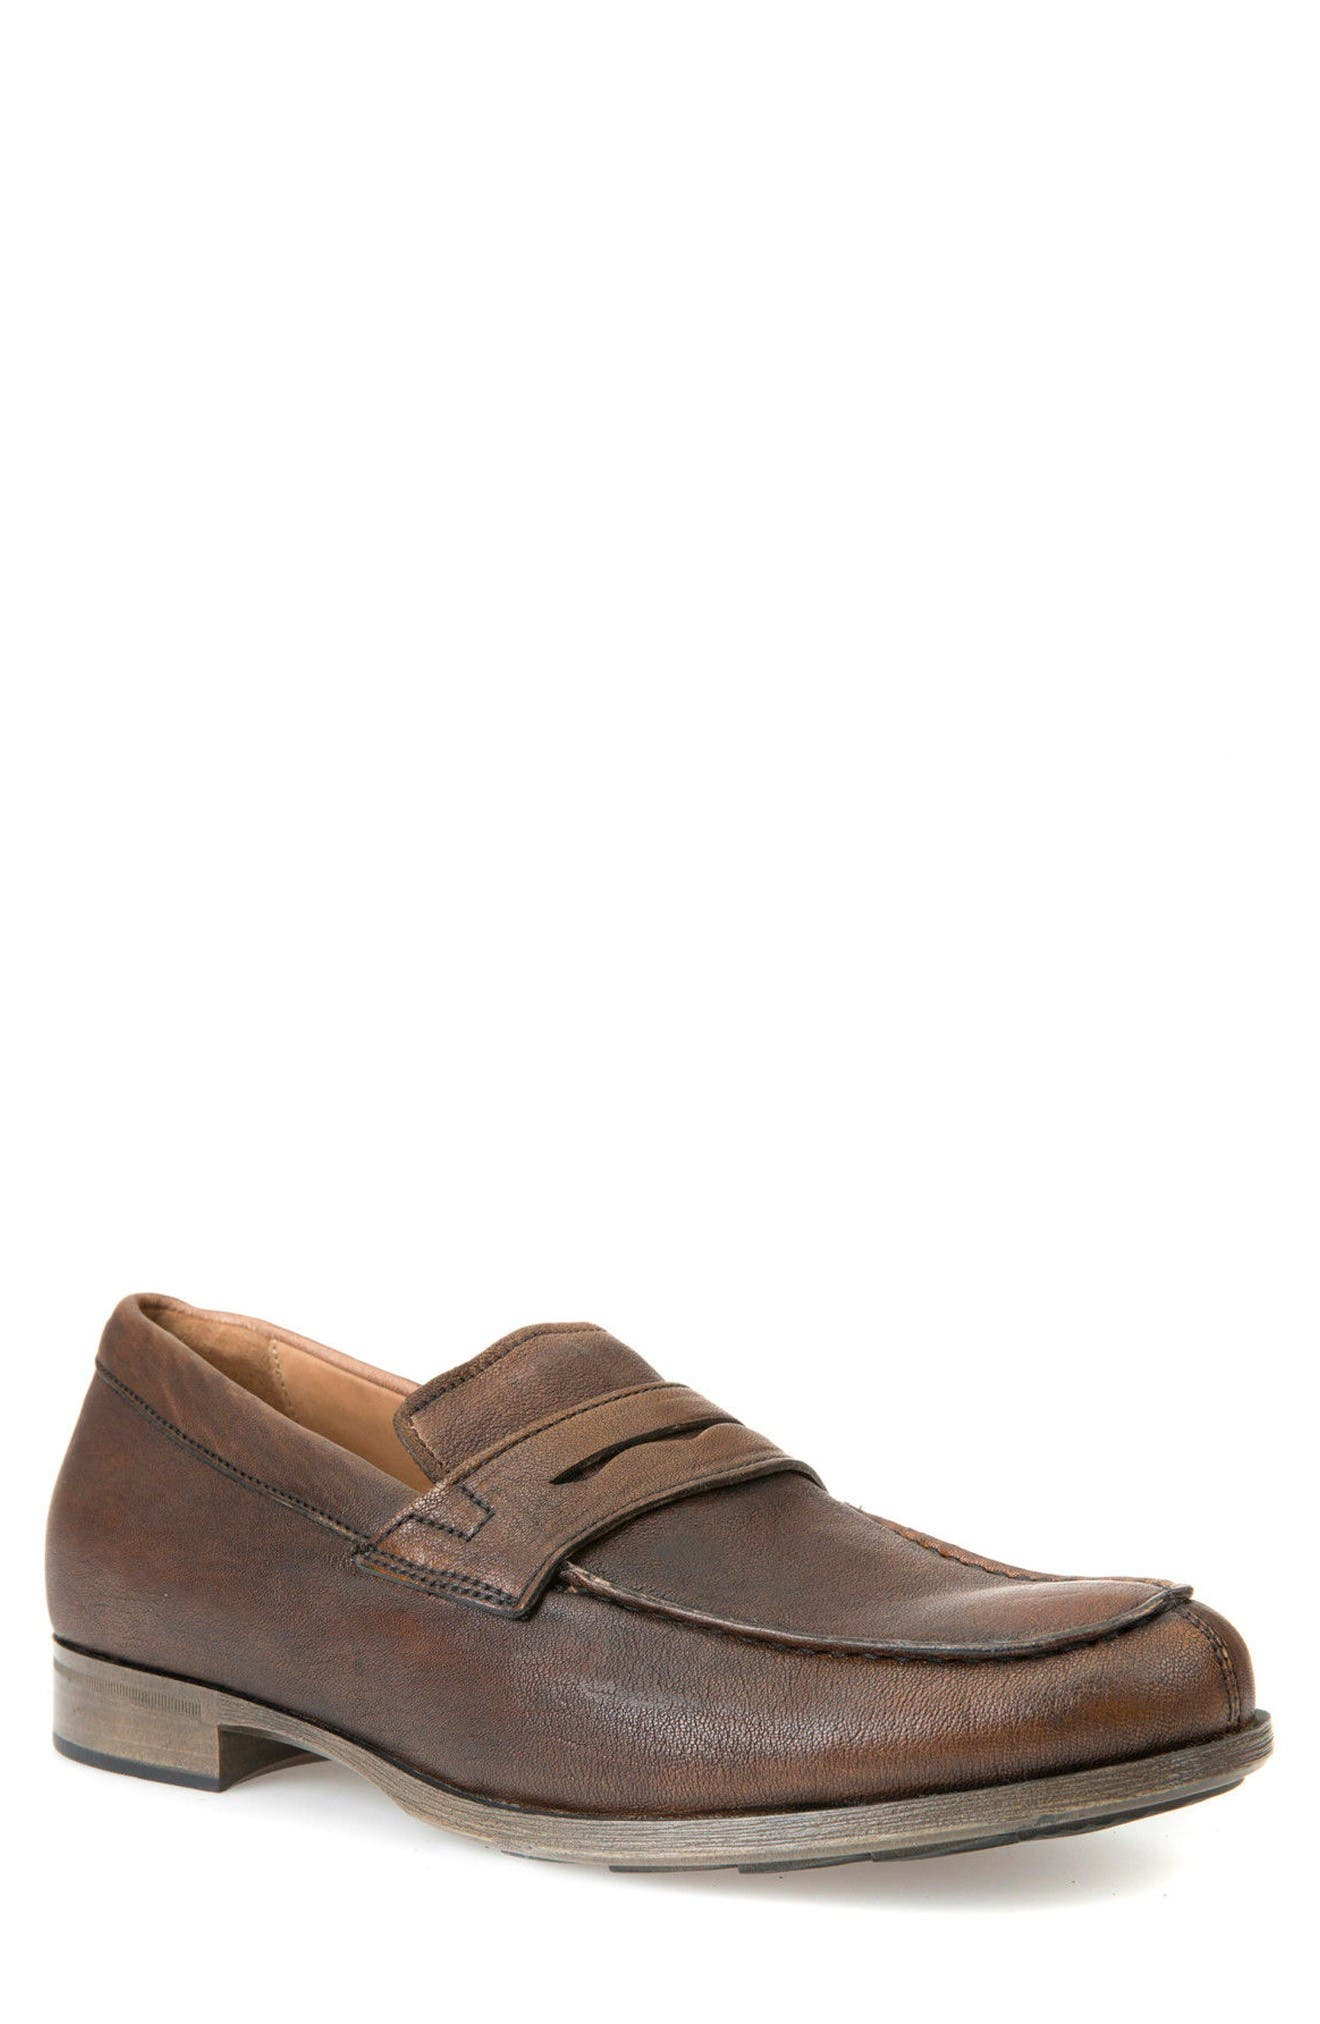 Geox Besmington 6 Penny Loafer (Men)